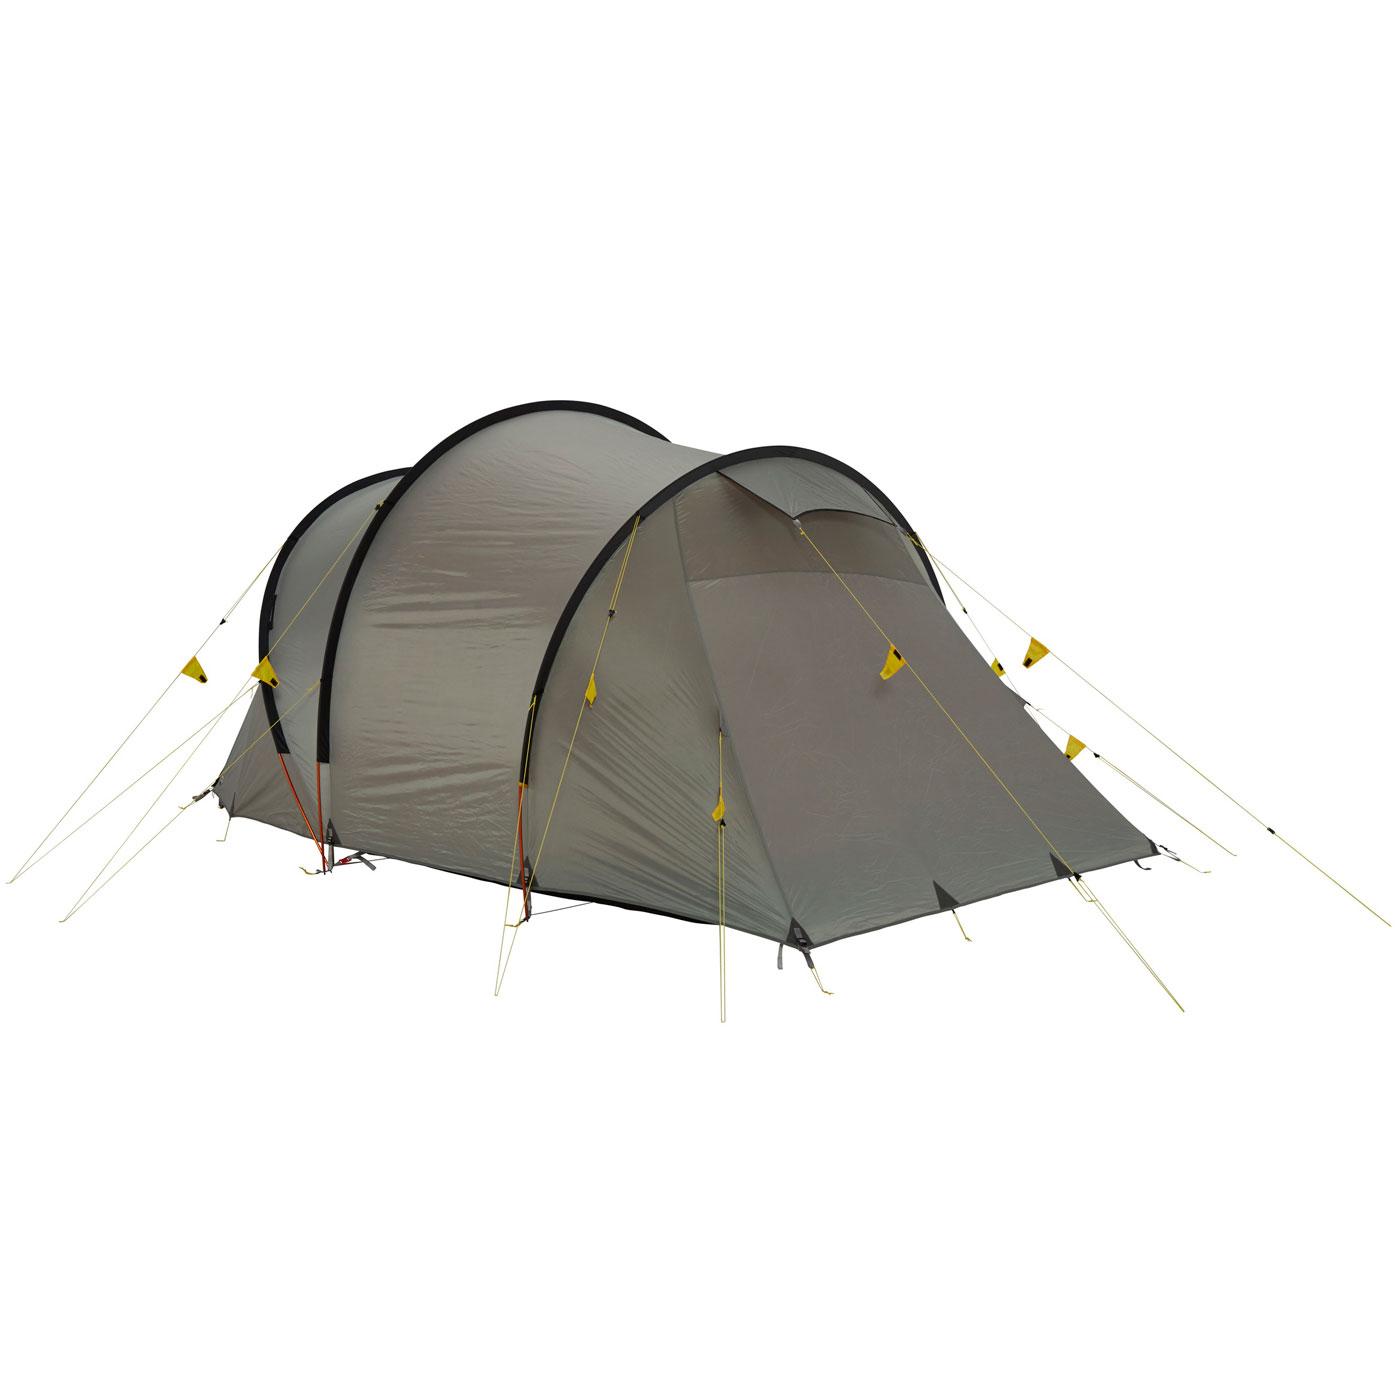 Image of Wechsel Voyager Tent - Laurel Oak